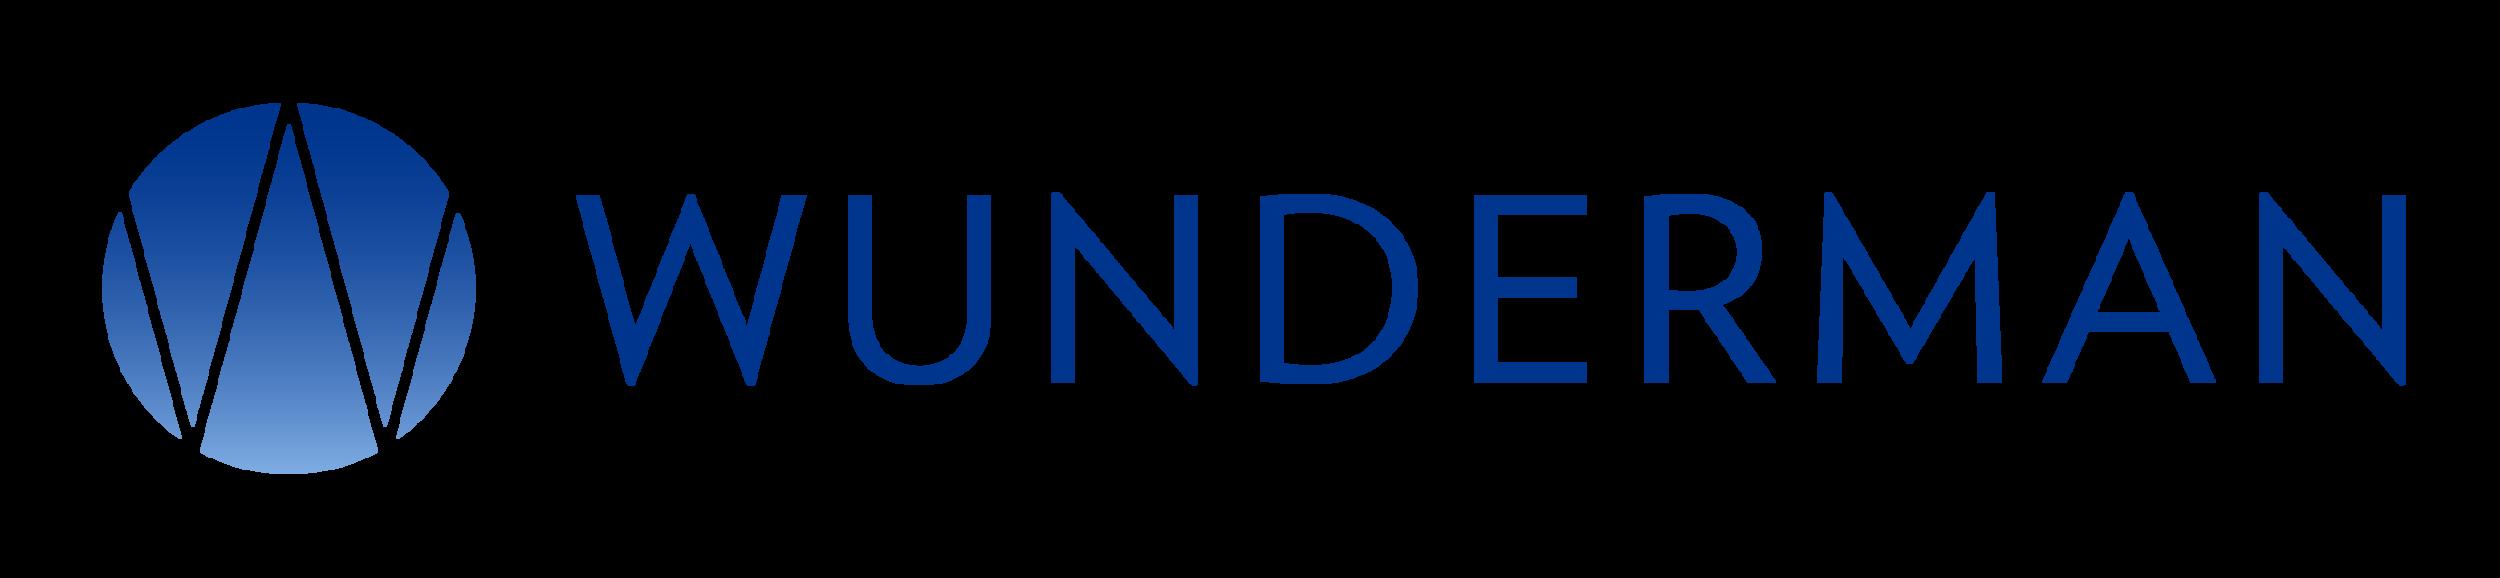 Wunderman_Logo_Horizontal_Gradient_RGB_2015.png